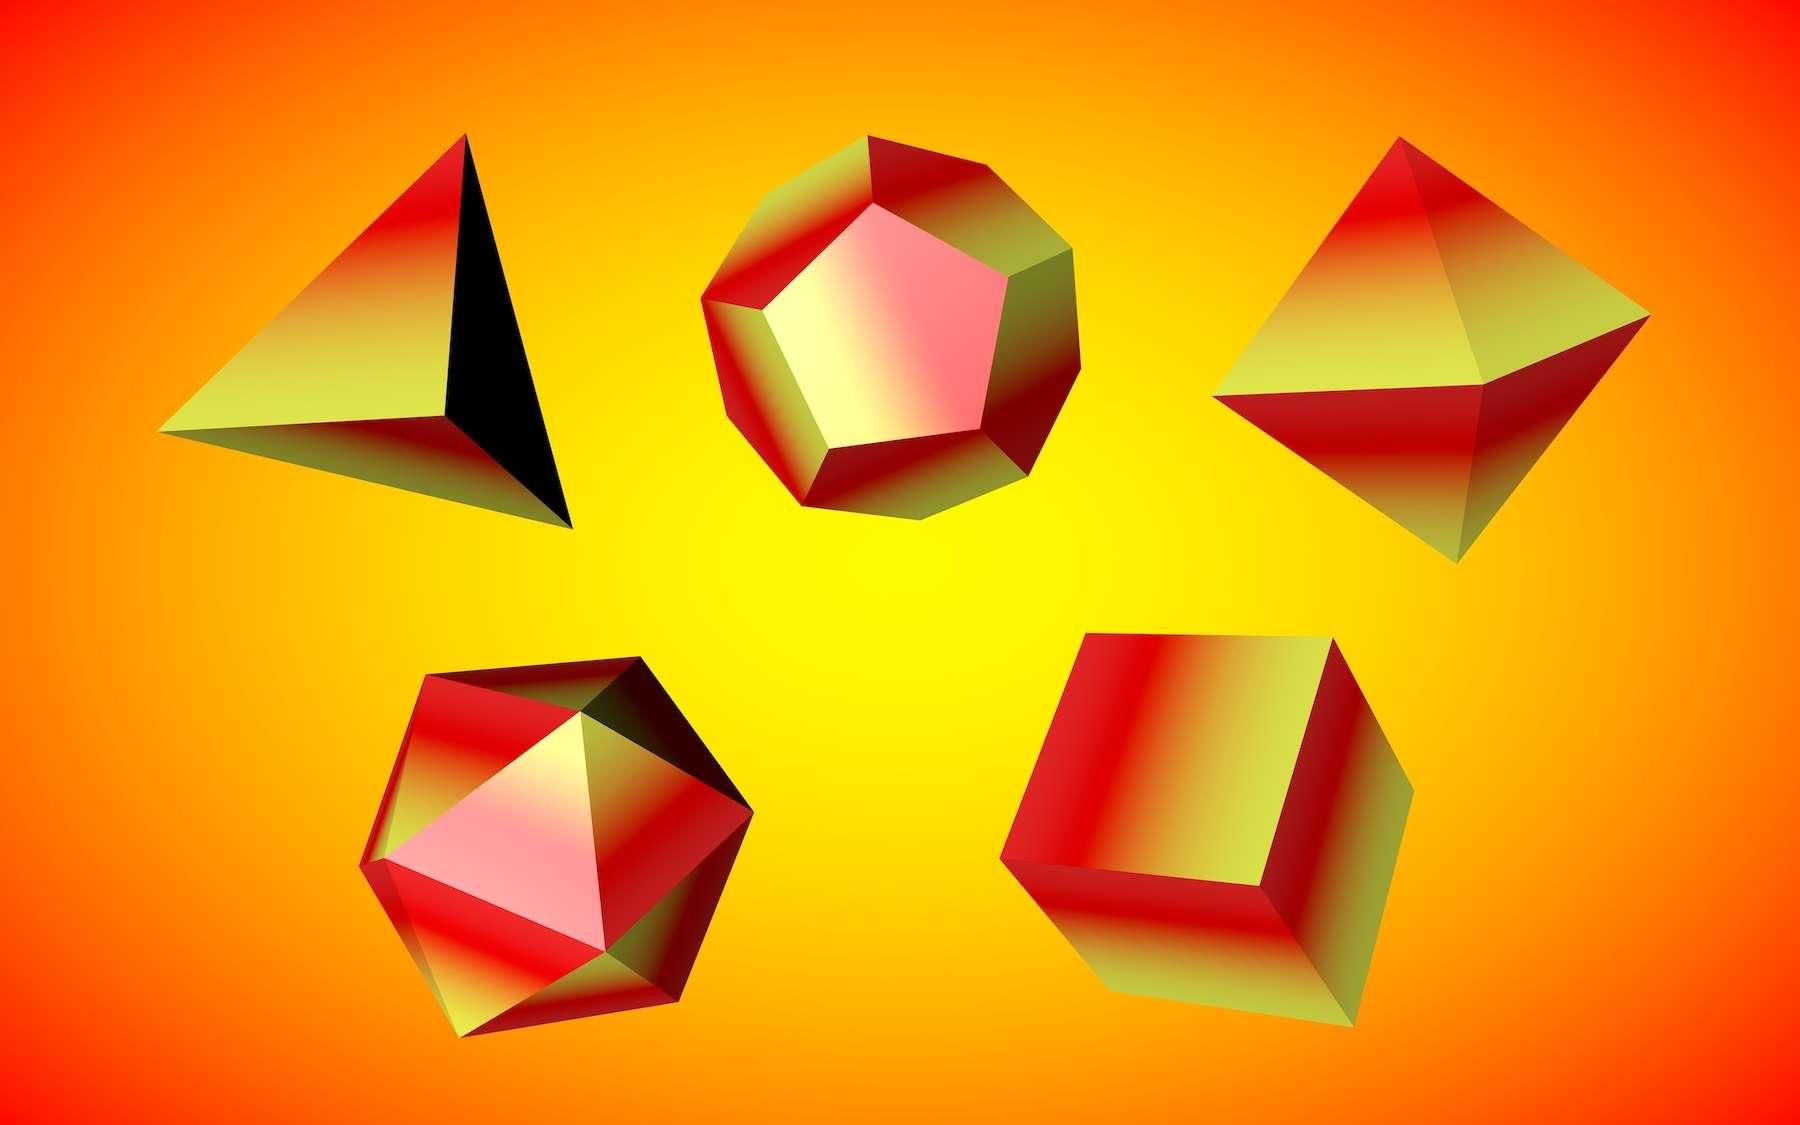 Quelques polyèdres courants. © Maryna Olyak, Adobe Stock